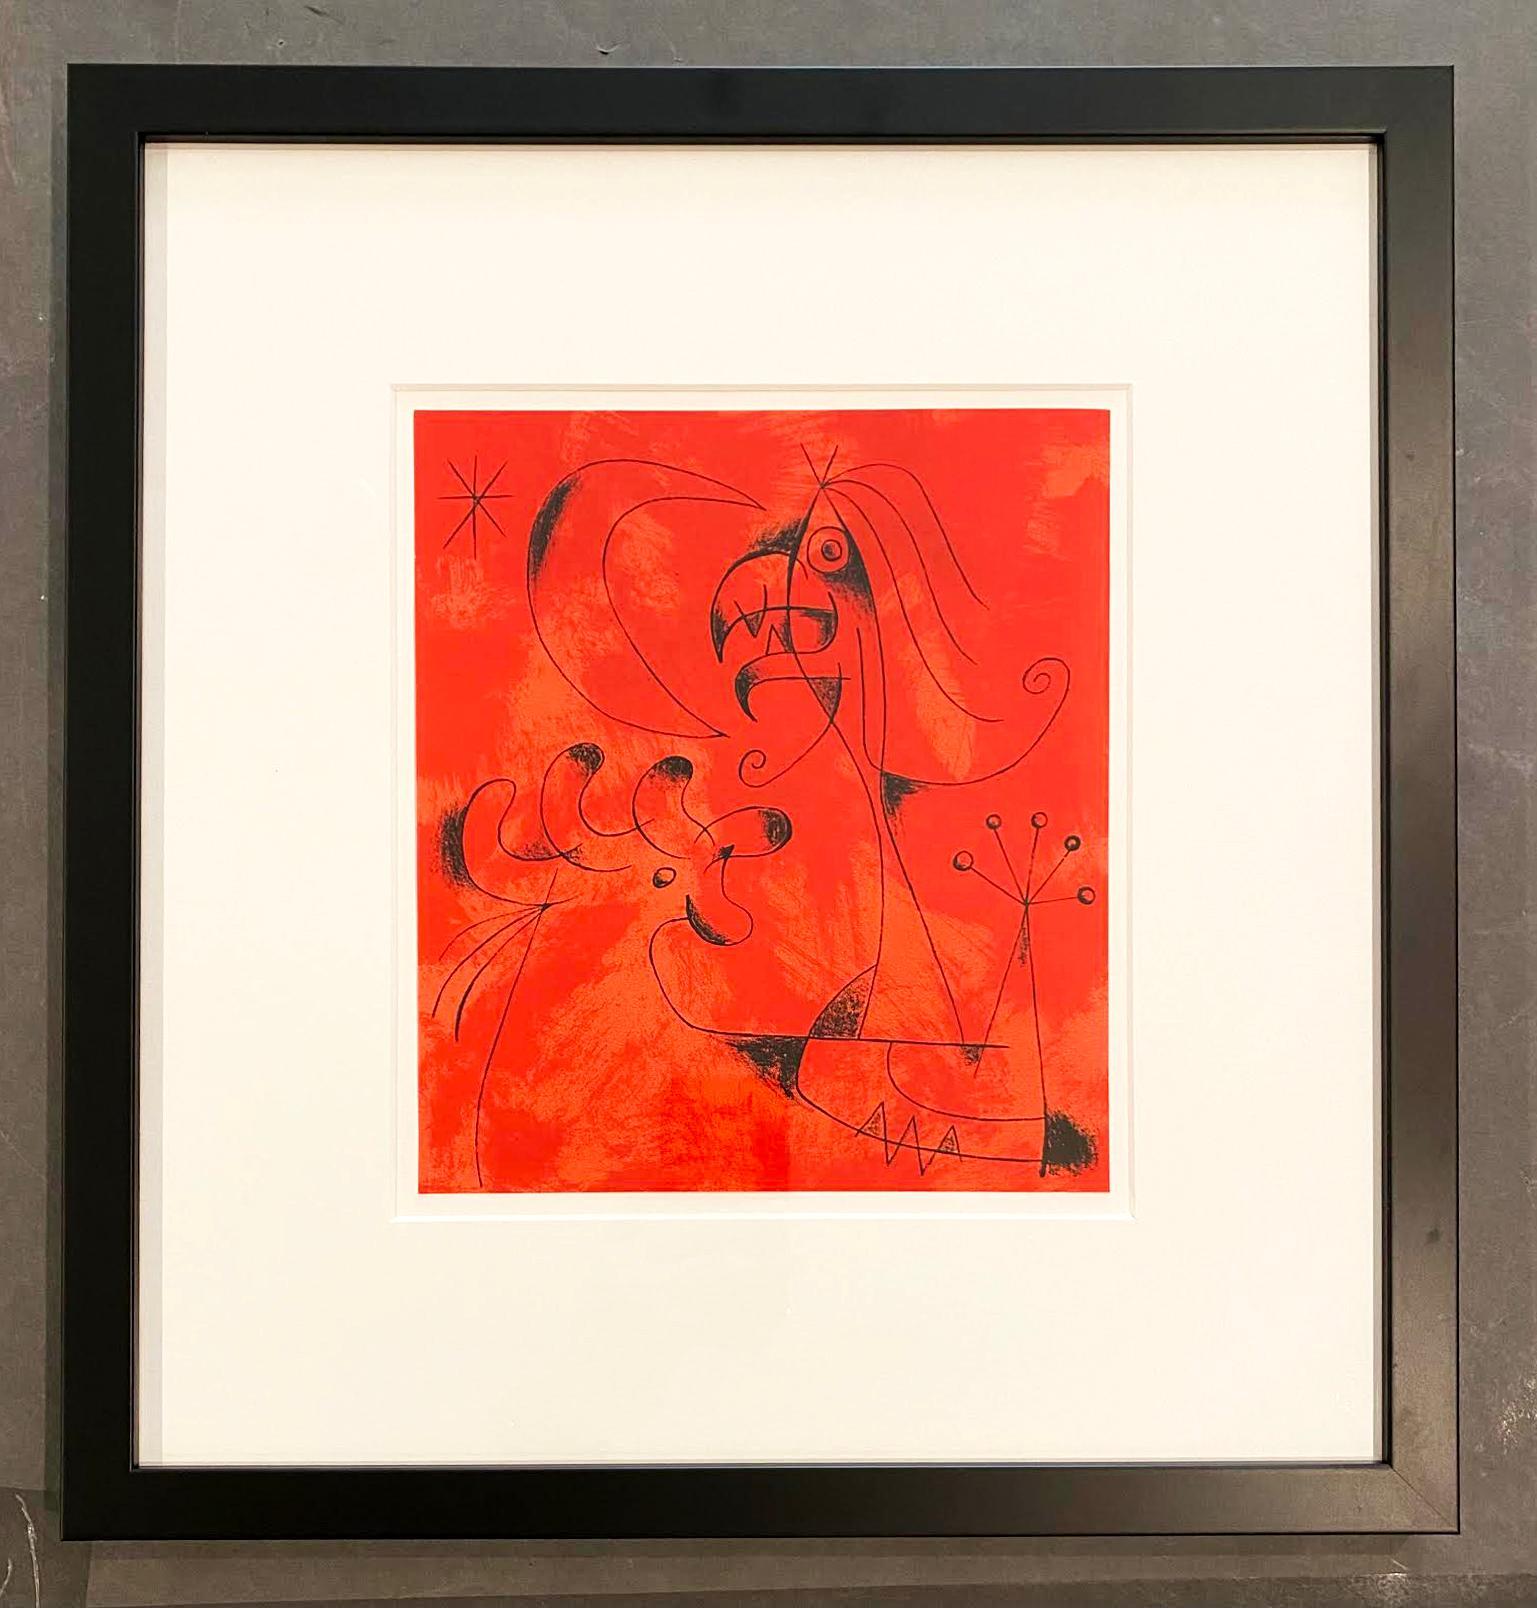 Joan Miro (Plate 6)